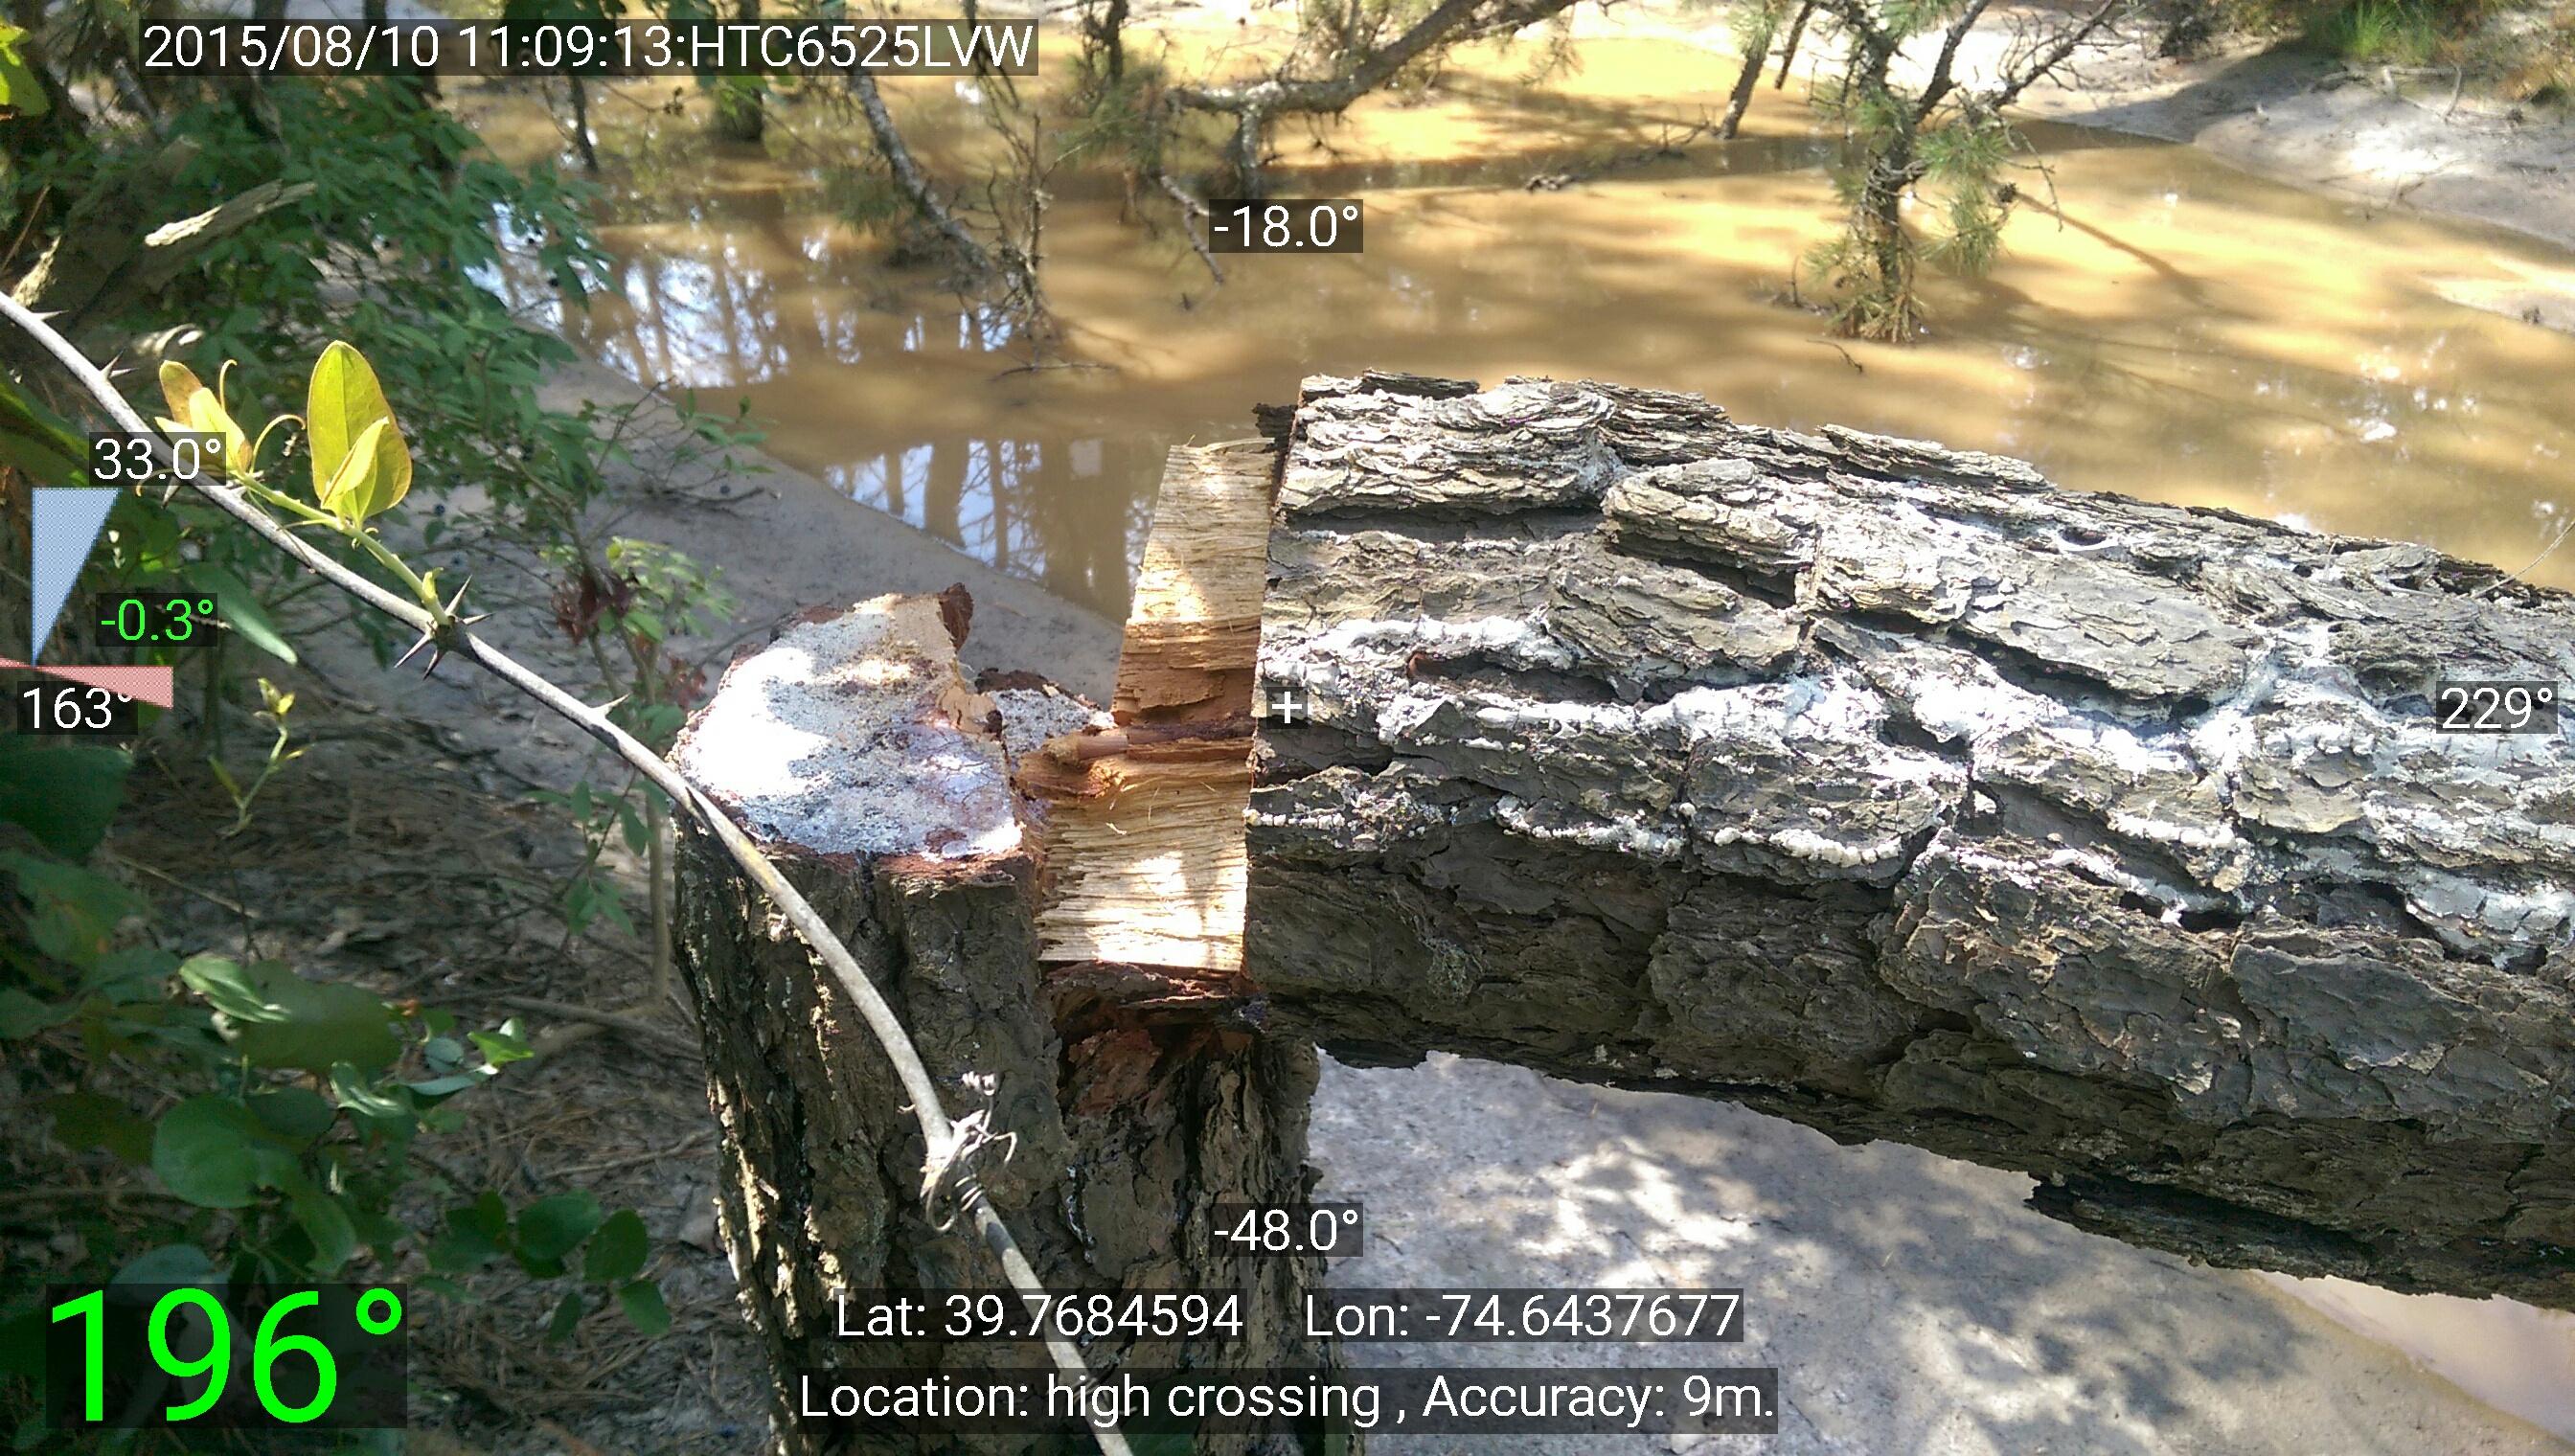 high crossing. L.39.7684594_-74.6437677 D.196 T.20150810_110912